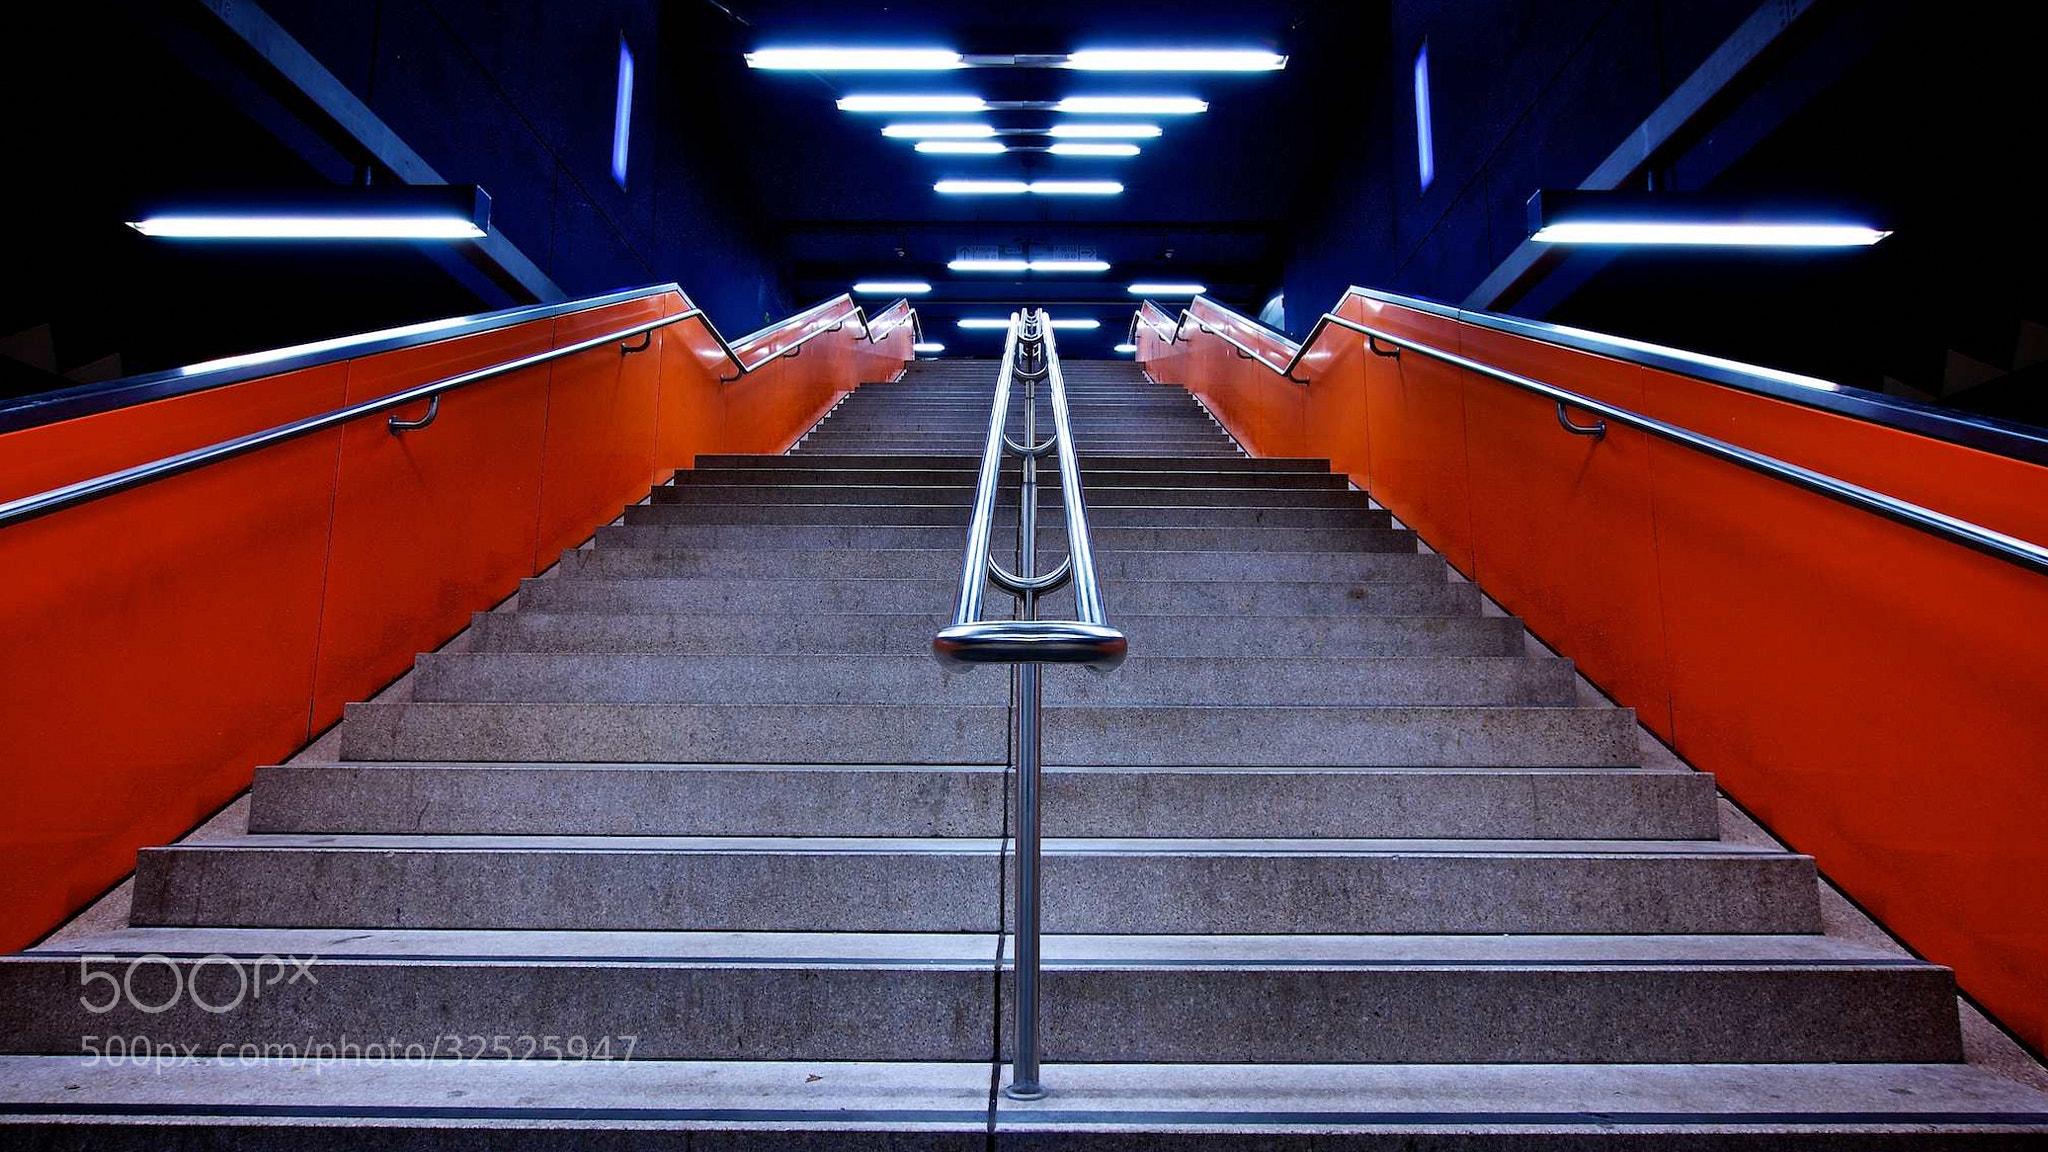 Photograph Stairs & Orange II by Thomas Bonfert on 500px